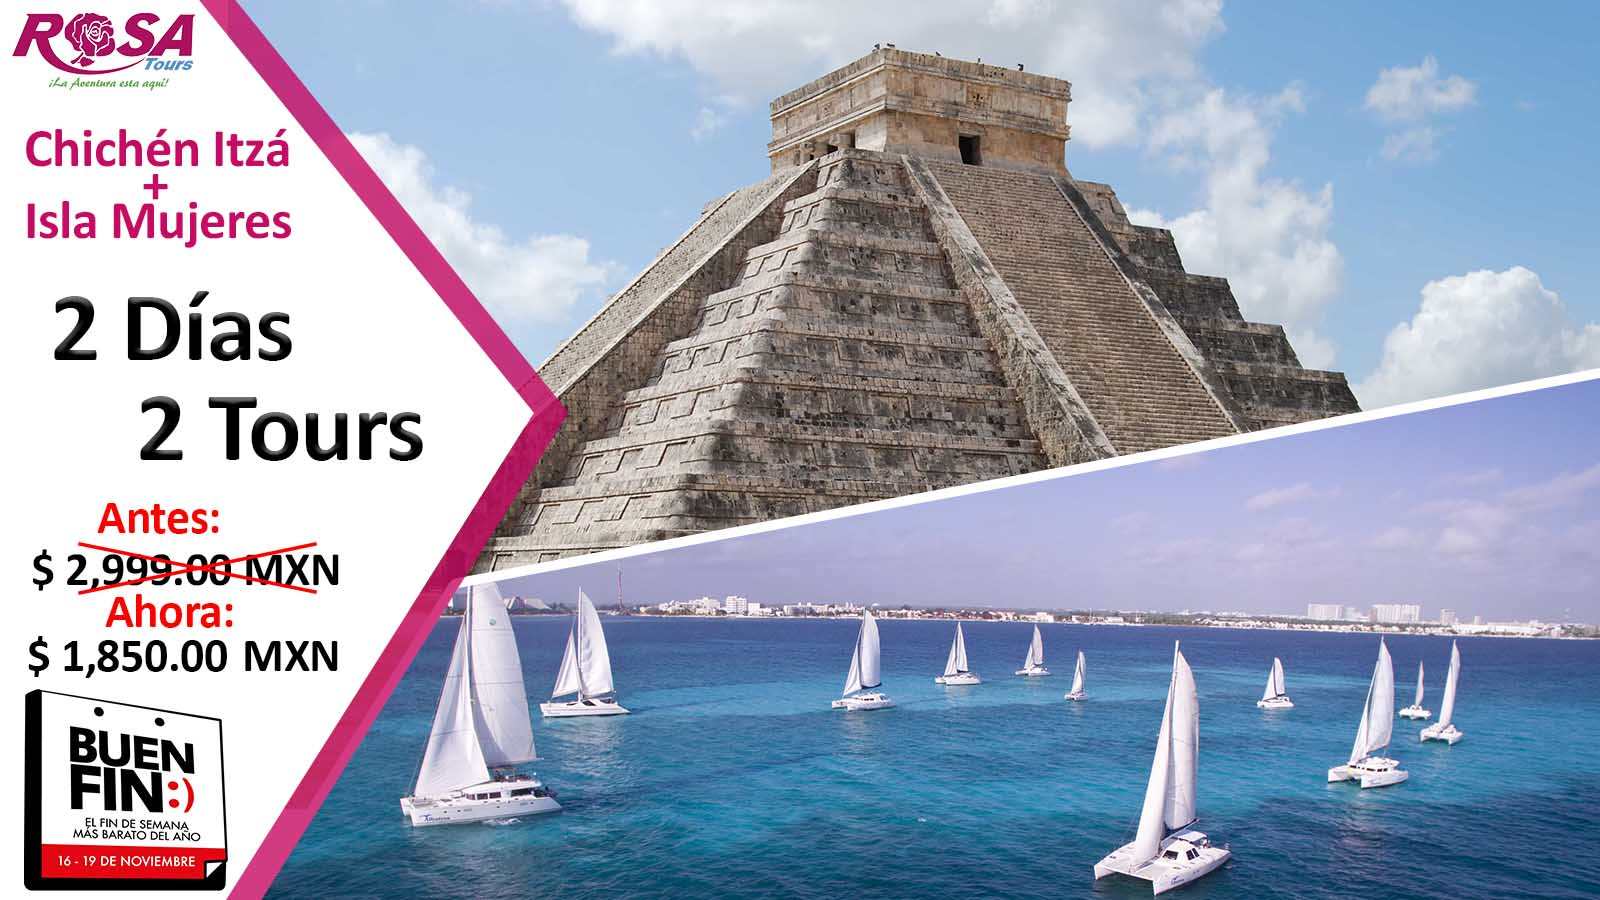 Tour de 2 días - Chichen Itza + Isla Mujeres &IN